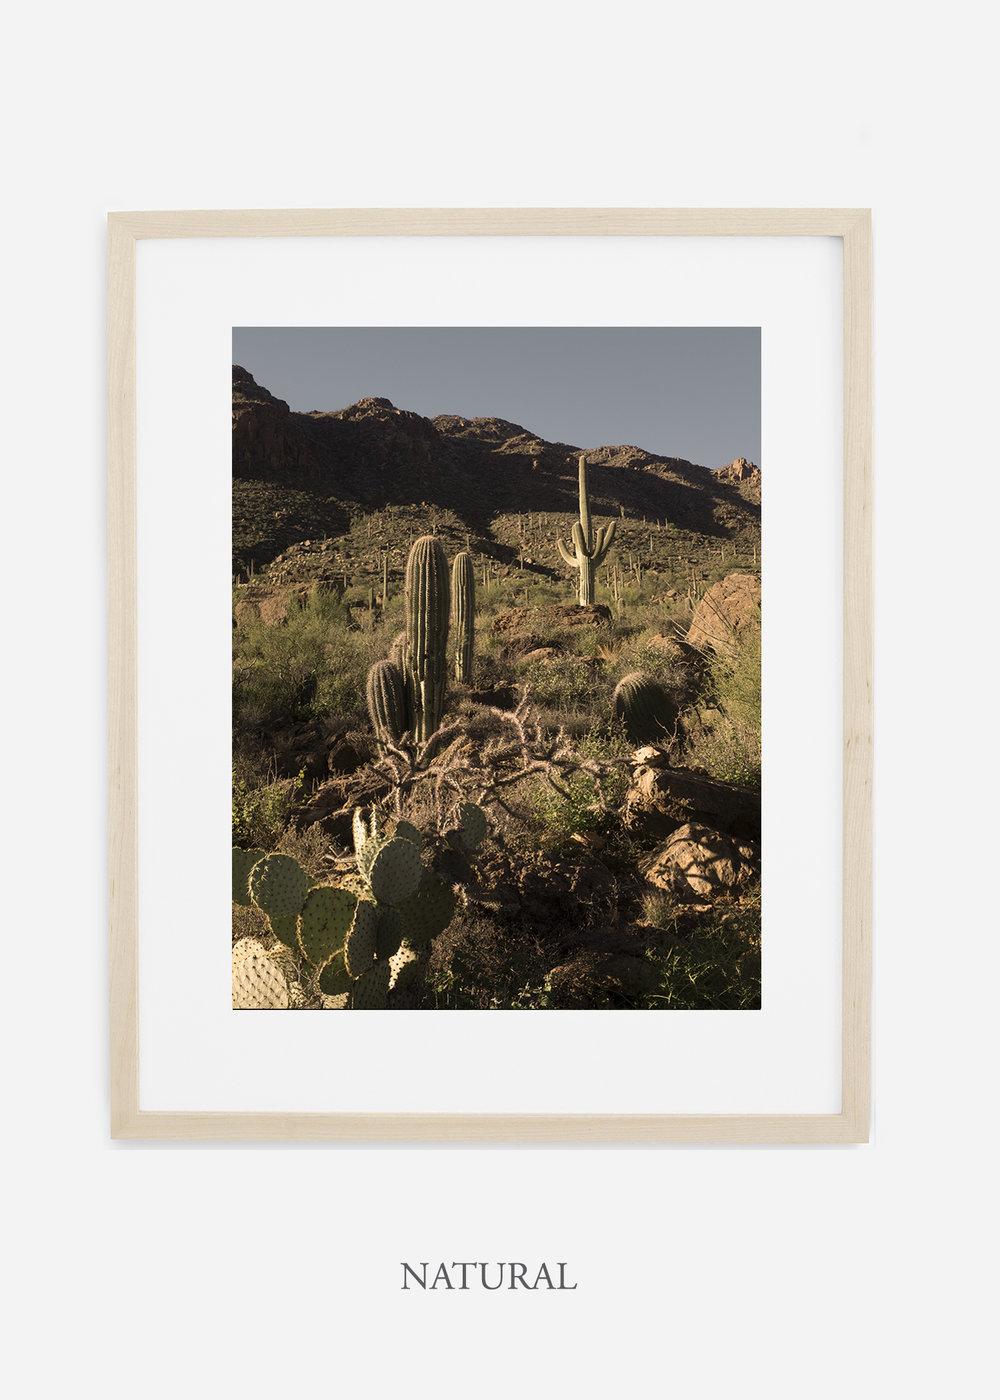 naturalframe-saguaroNo.18-wildercalifornia-art-wallart-cactusprint-homedecor-prints-arizona-botanical-artwork-interiordesign.jpg